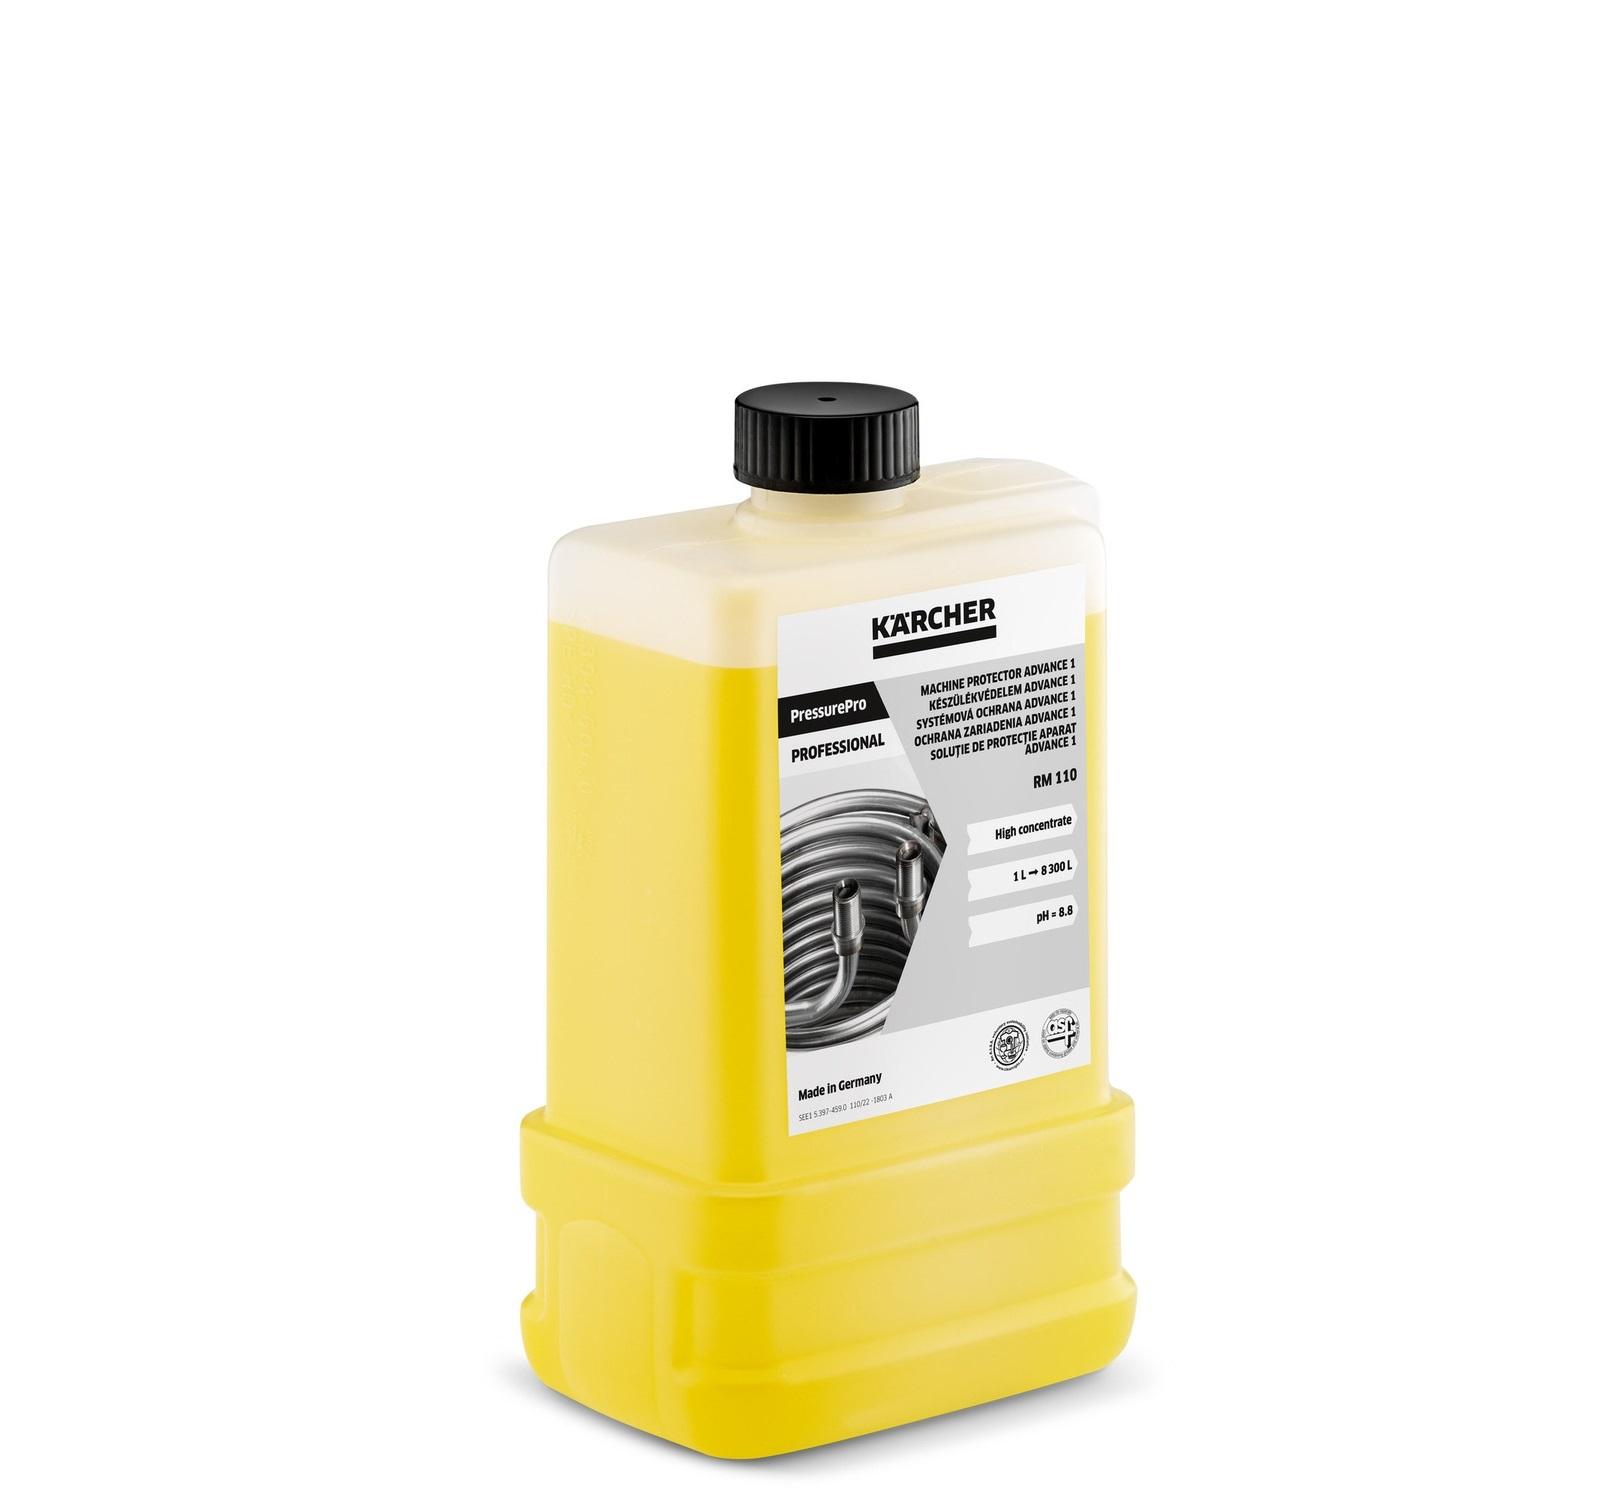 Professional detergents